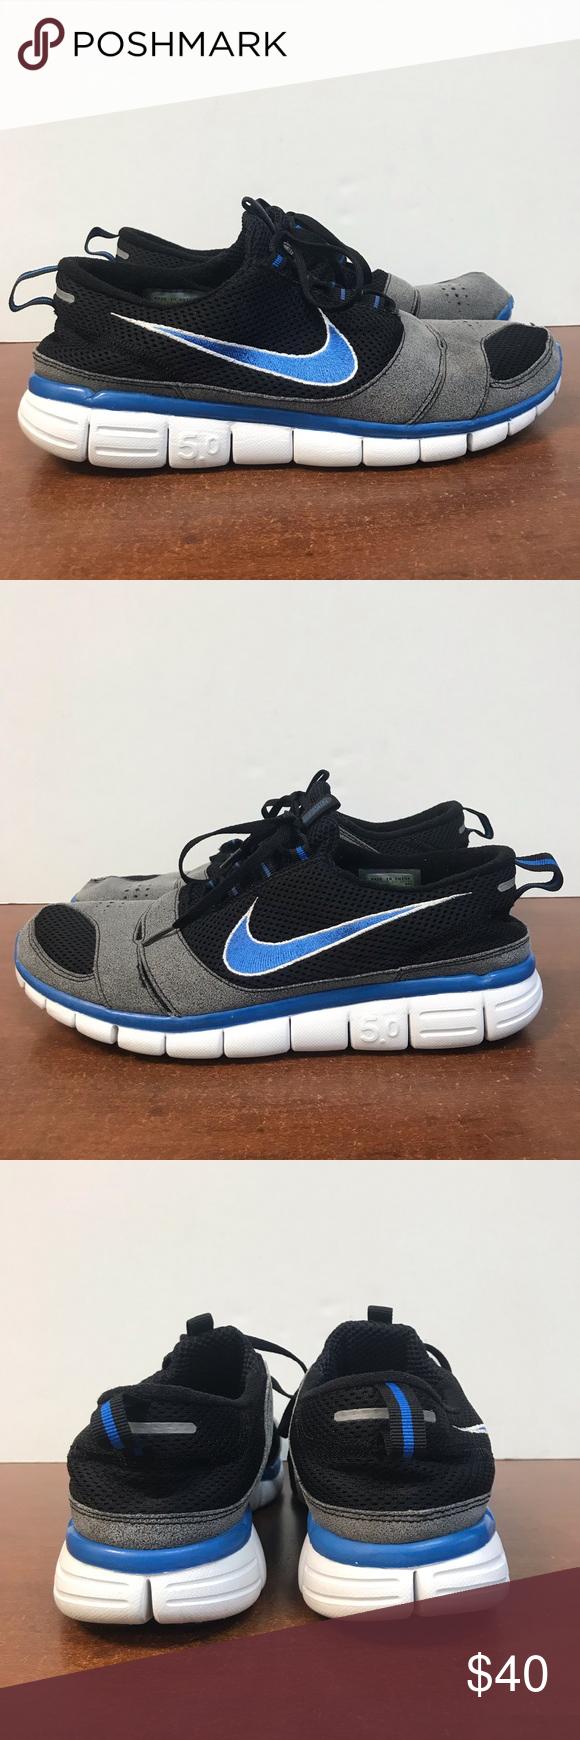 Nike Free Run 5.0 Men's Size 10.5 Preowned Men's Nike Free